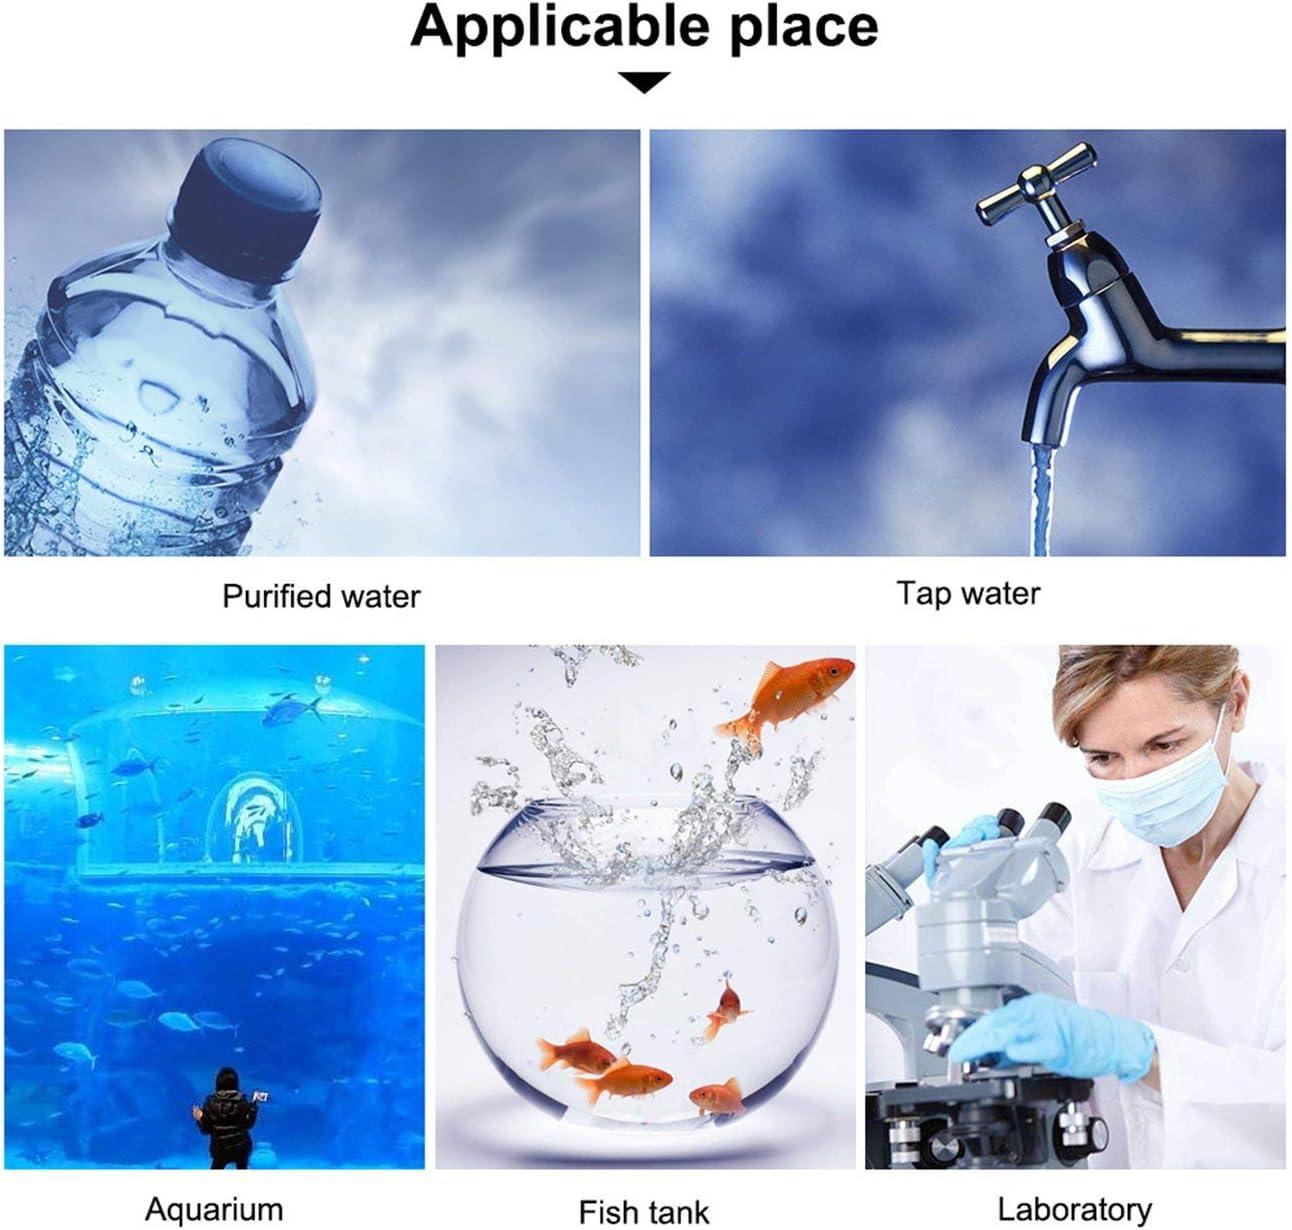 Blue JIUY Portable PH Meter Tester Pen Water Quality Purity Monitor Filter Measuring for Aquarium Wine Urine Digital Acidometer